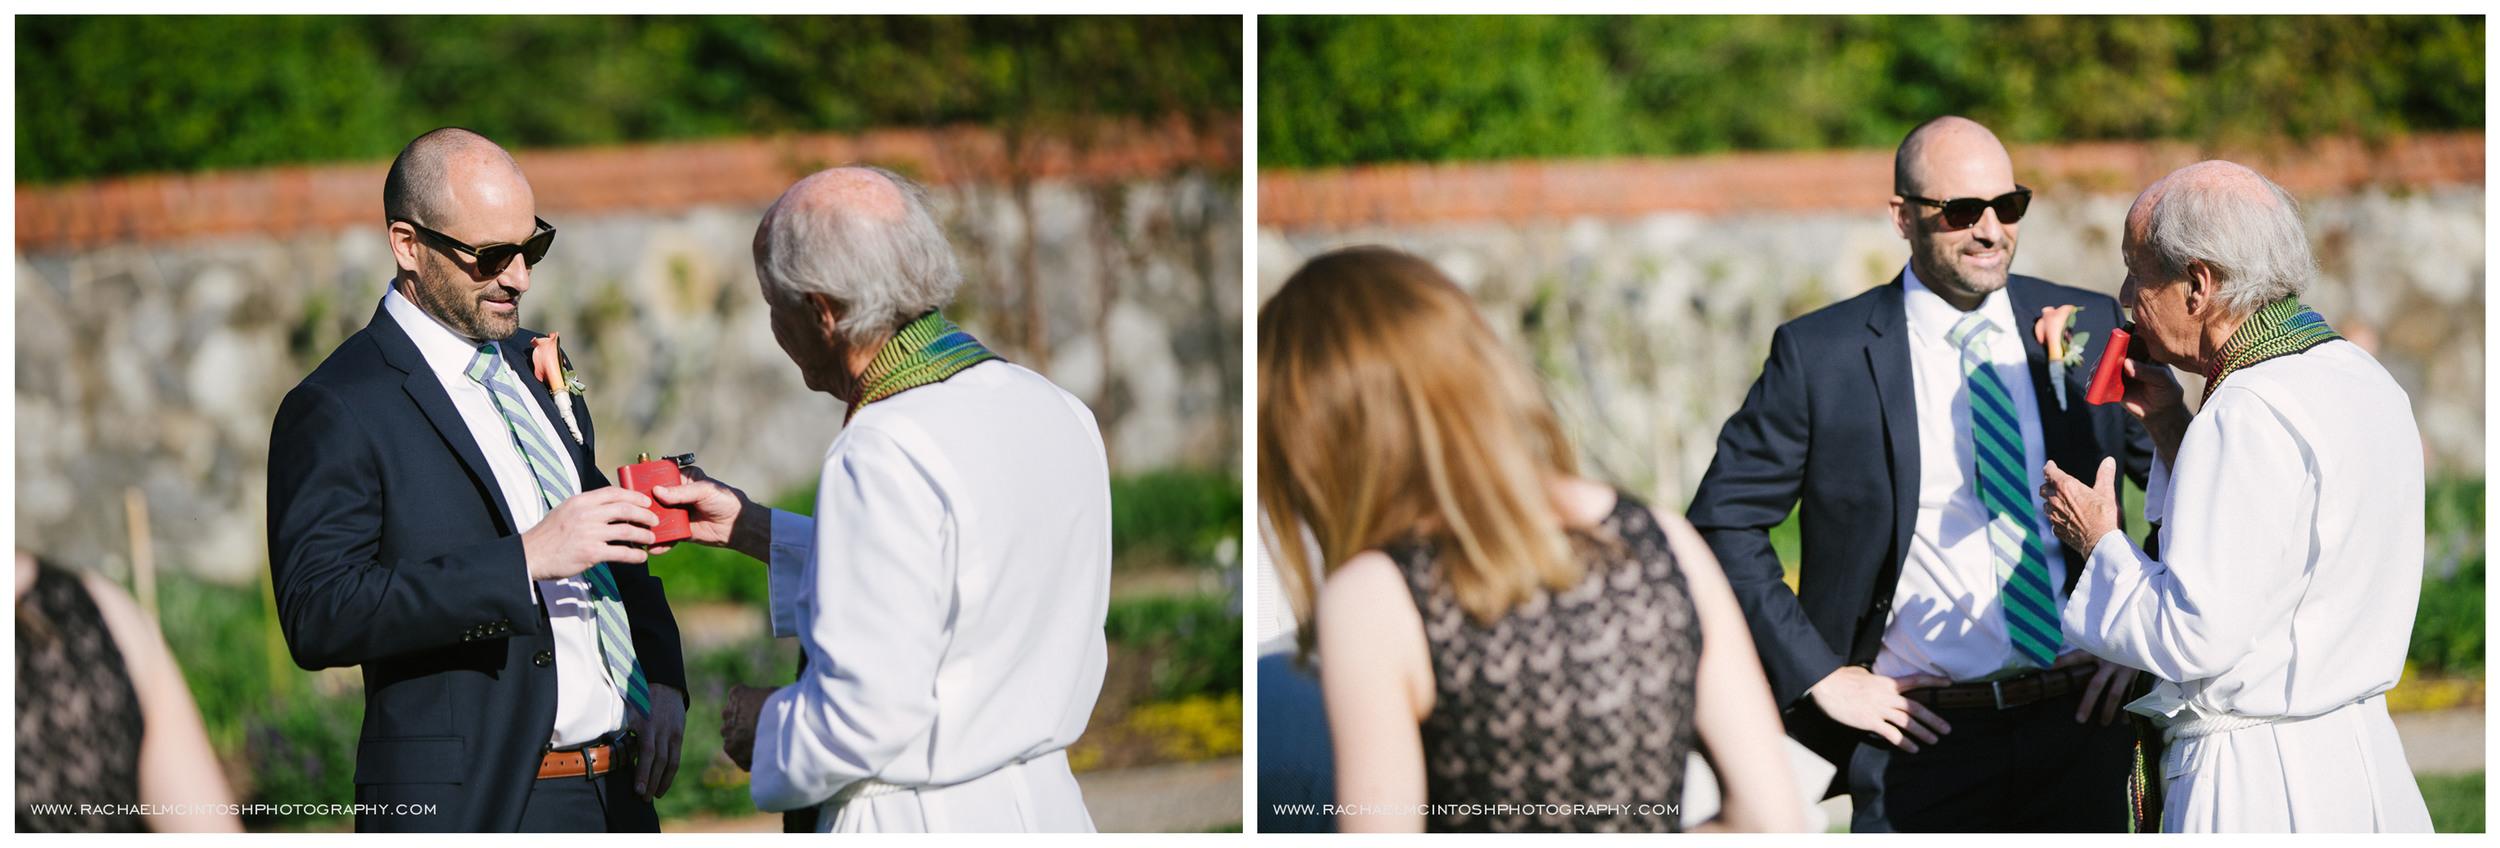 Biltmore Wedding Photographer 91.jpg